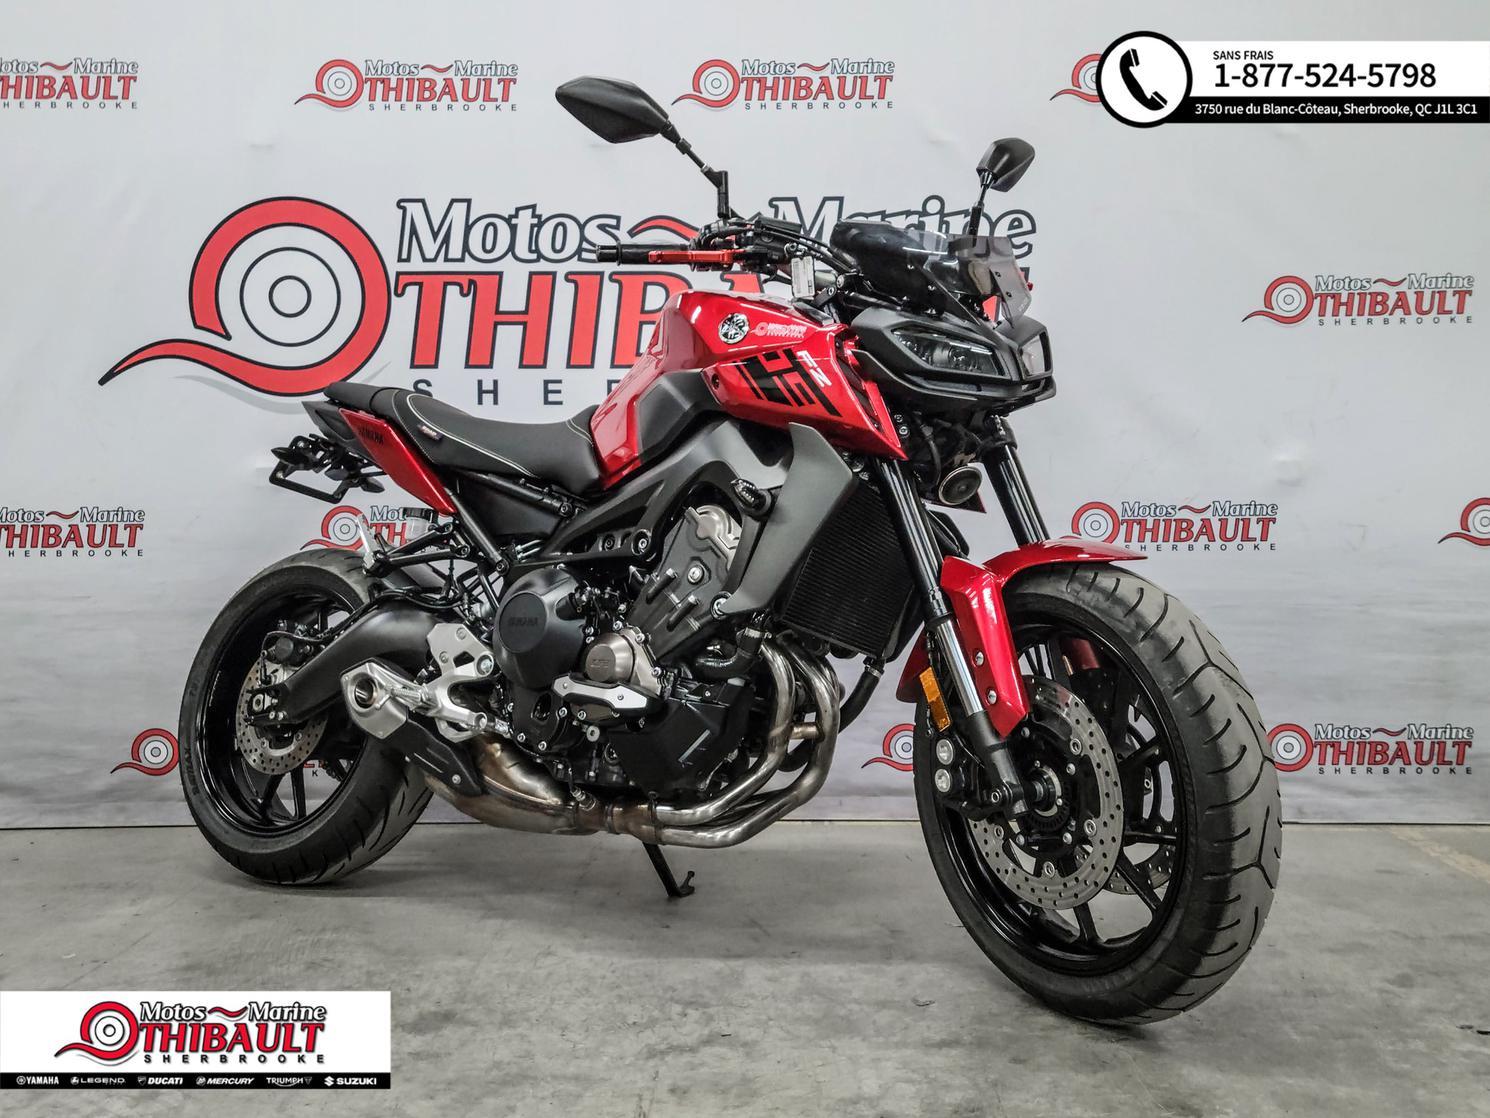 Yamaha FZ-09 - Naked ABS 2017